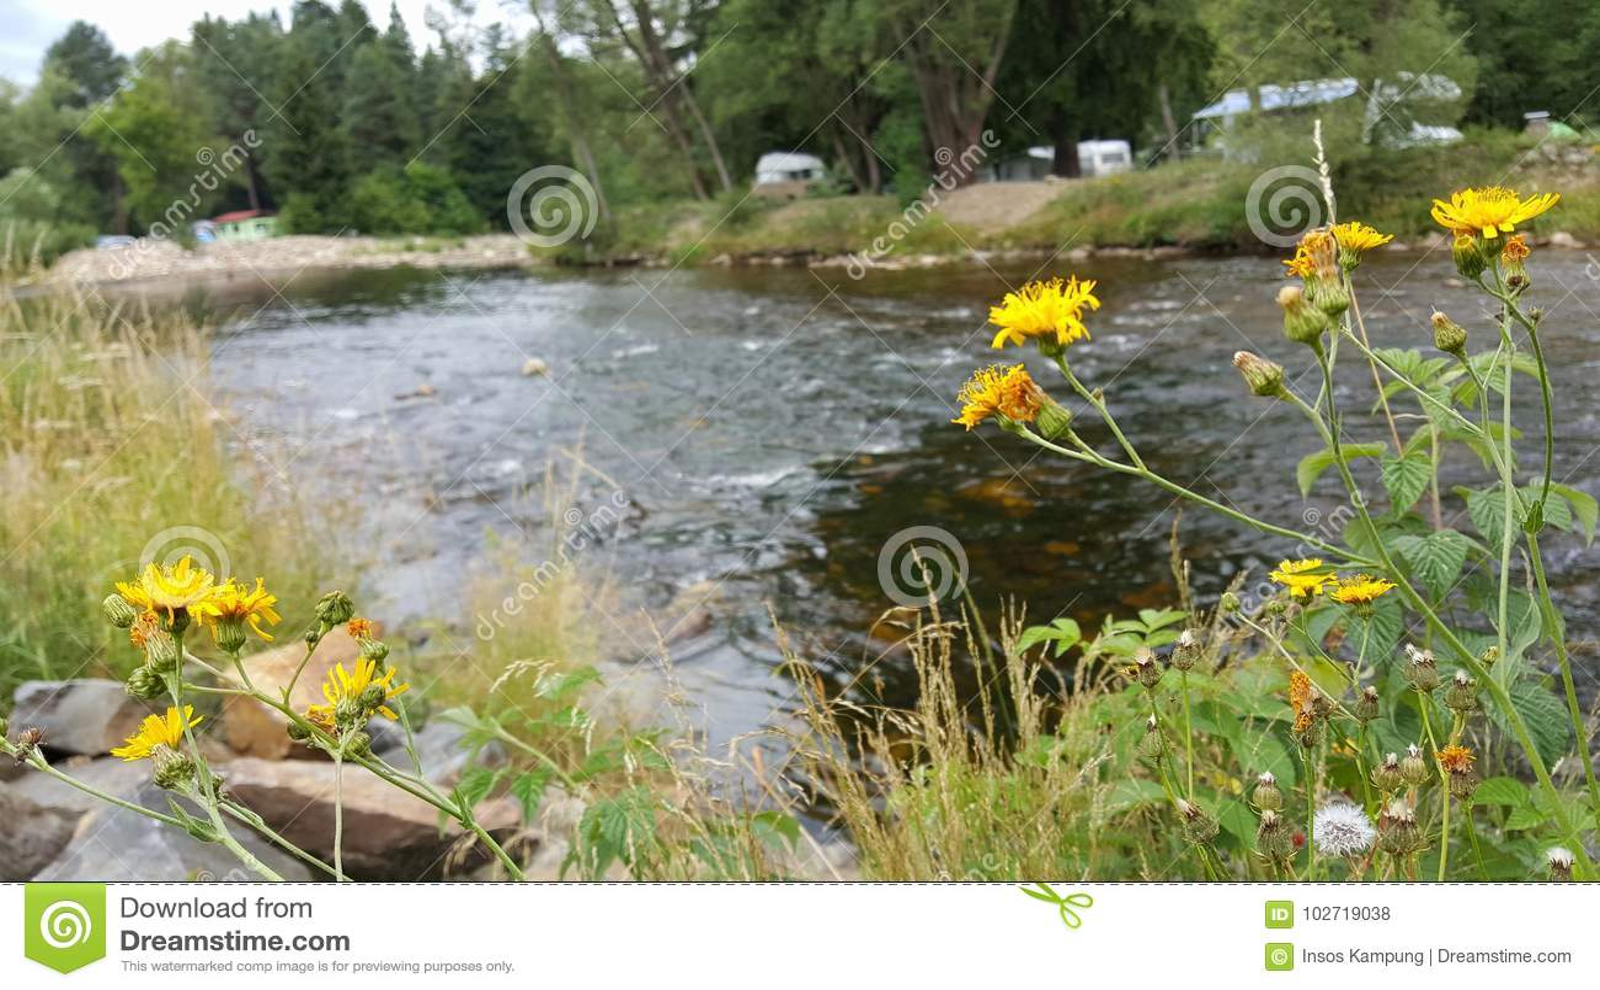 Otava River, Czech Republic